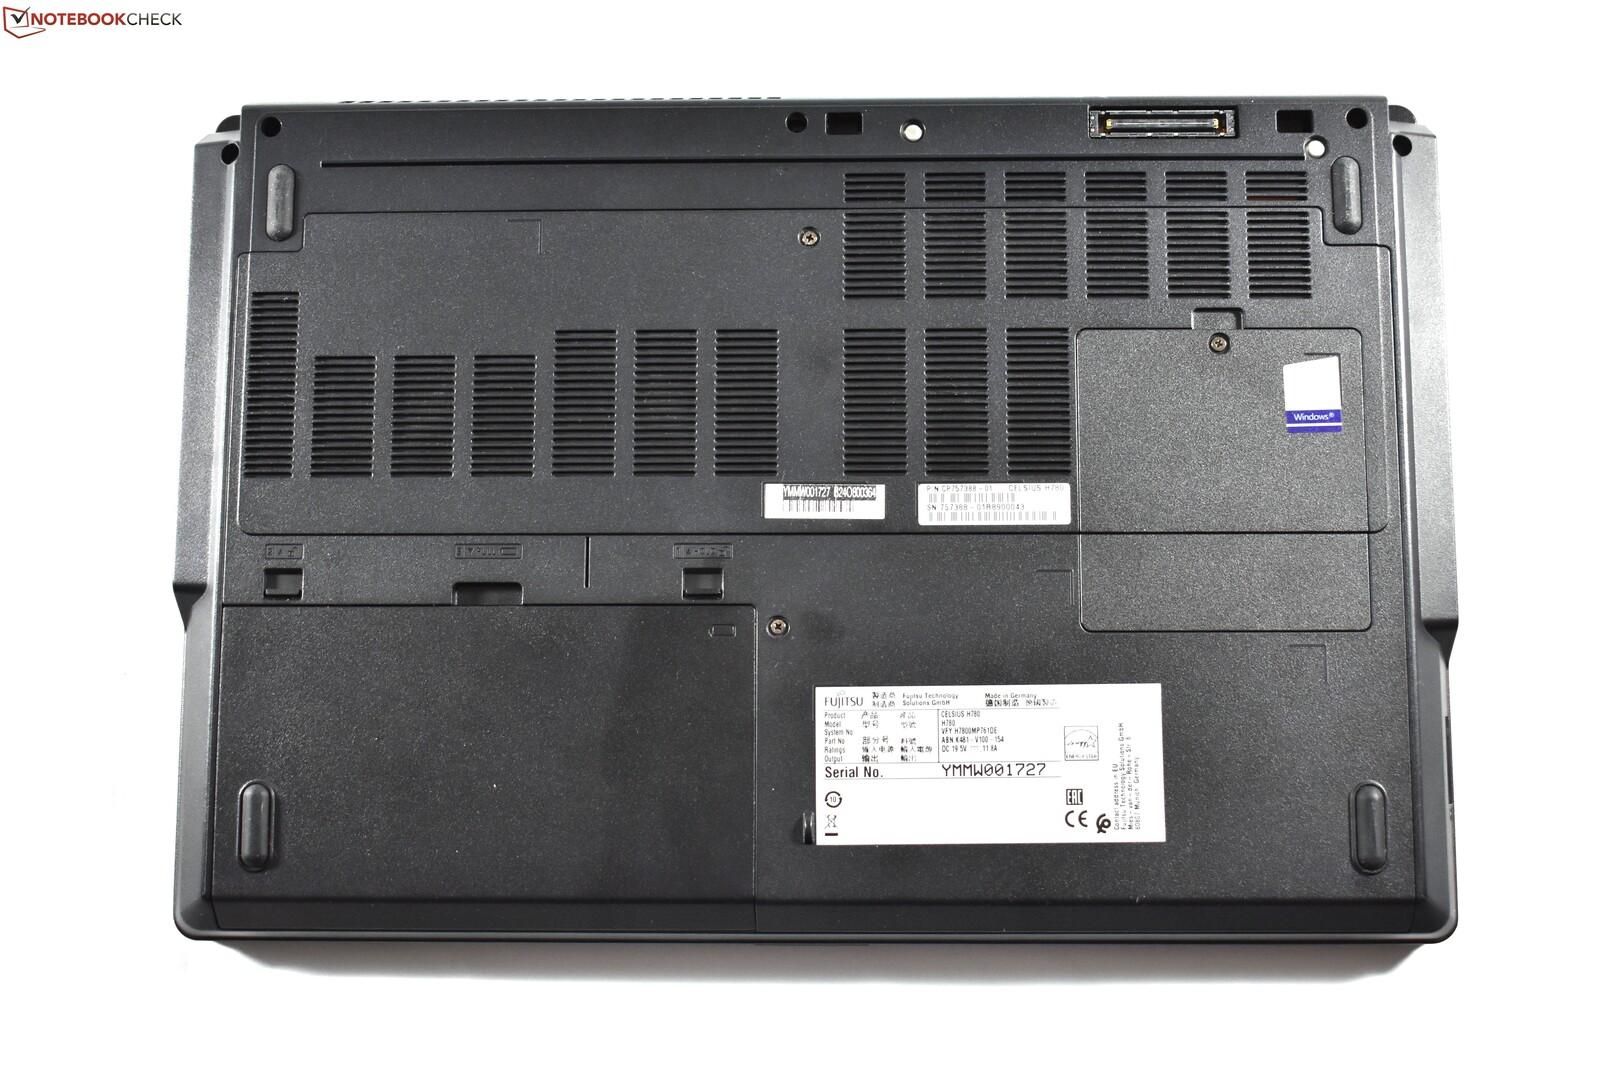 Fujitsu Celsius H780 I7 8850h P2000 Fhd Workstation